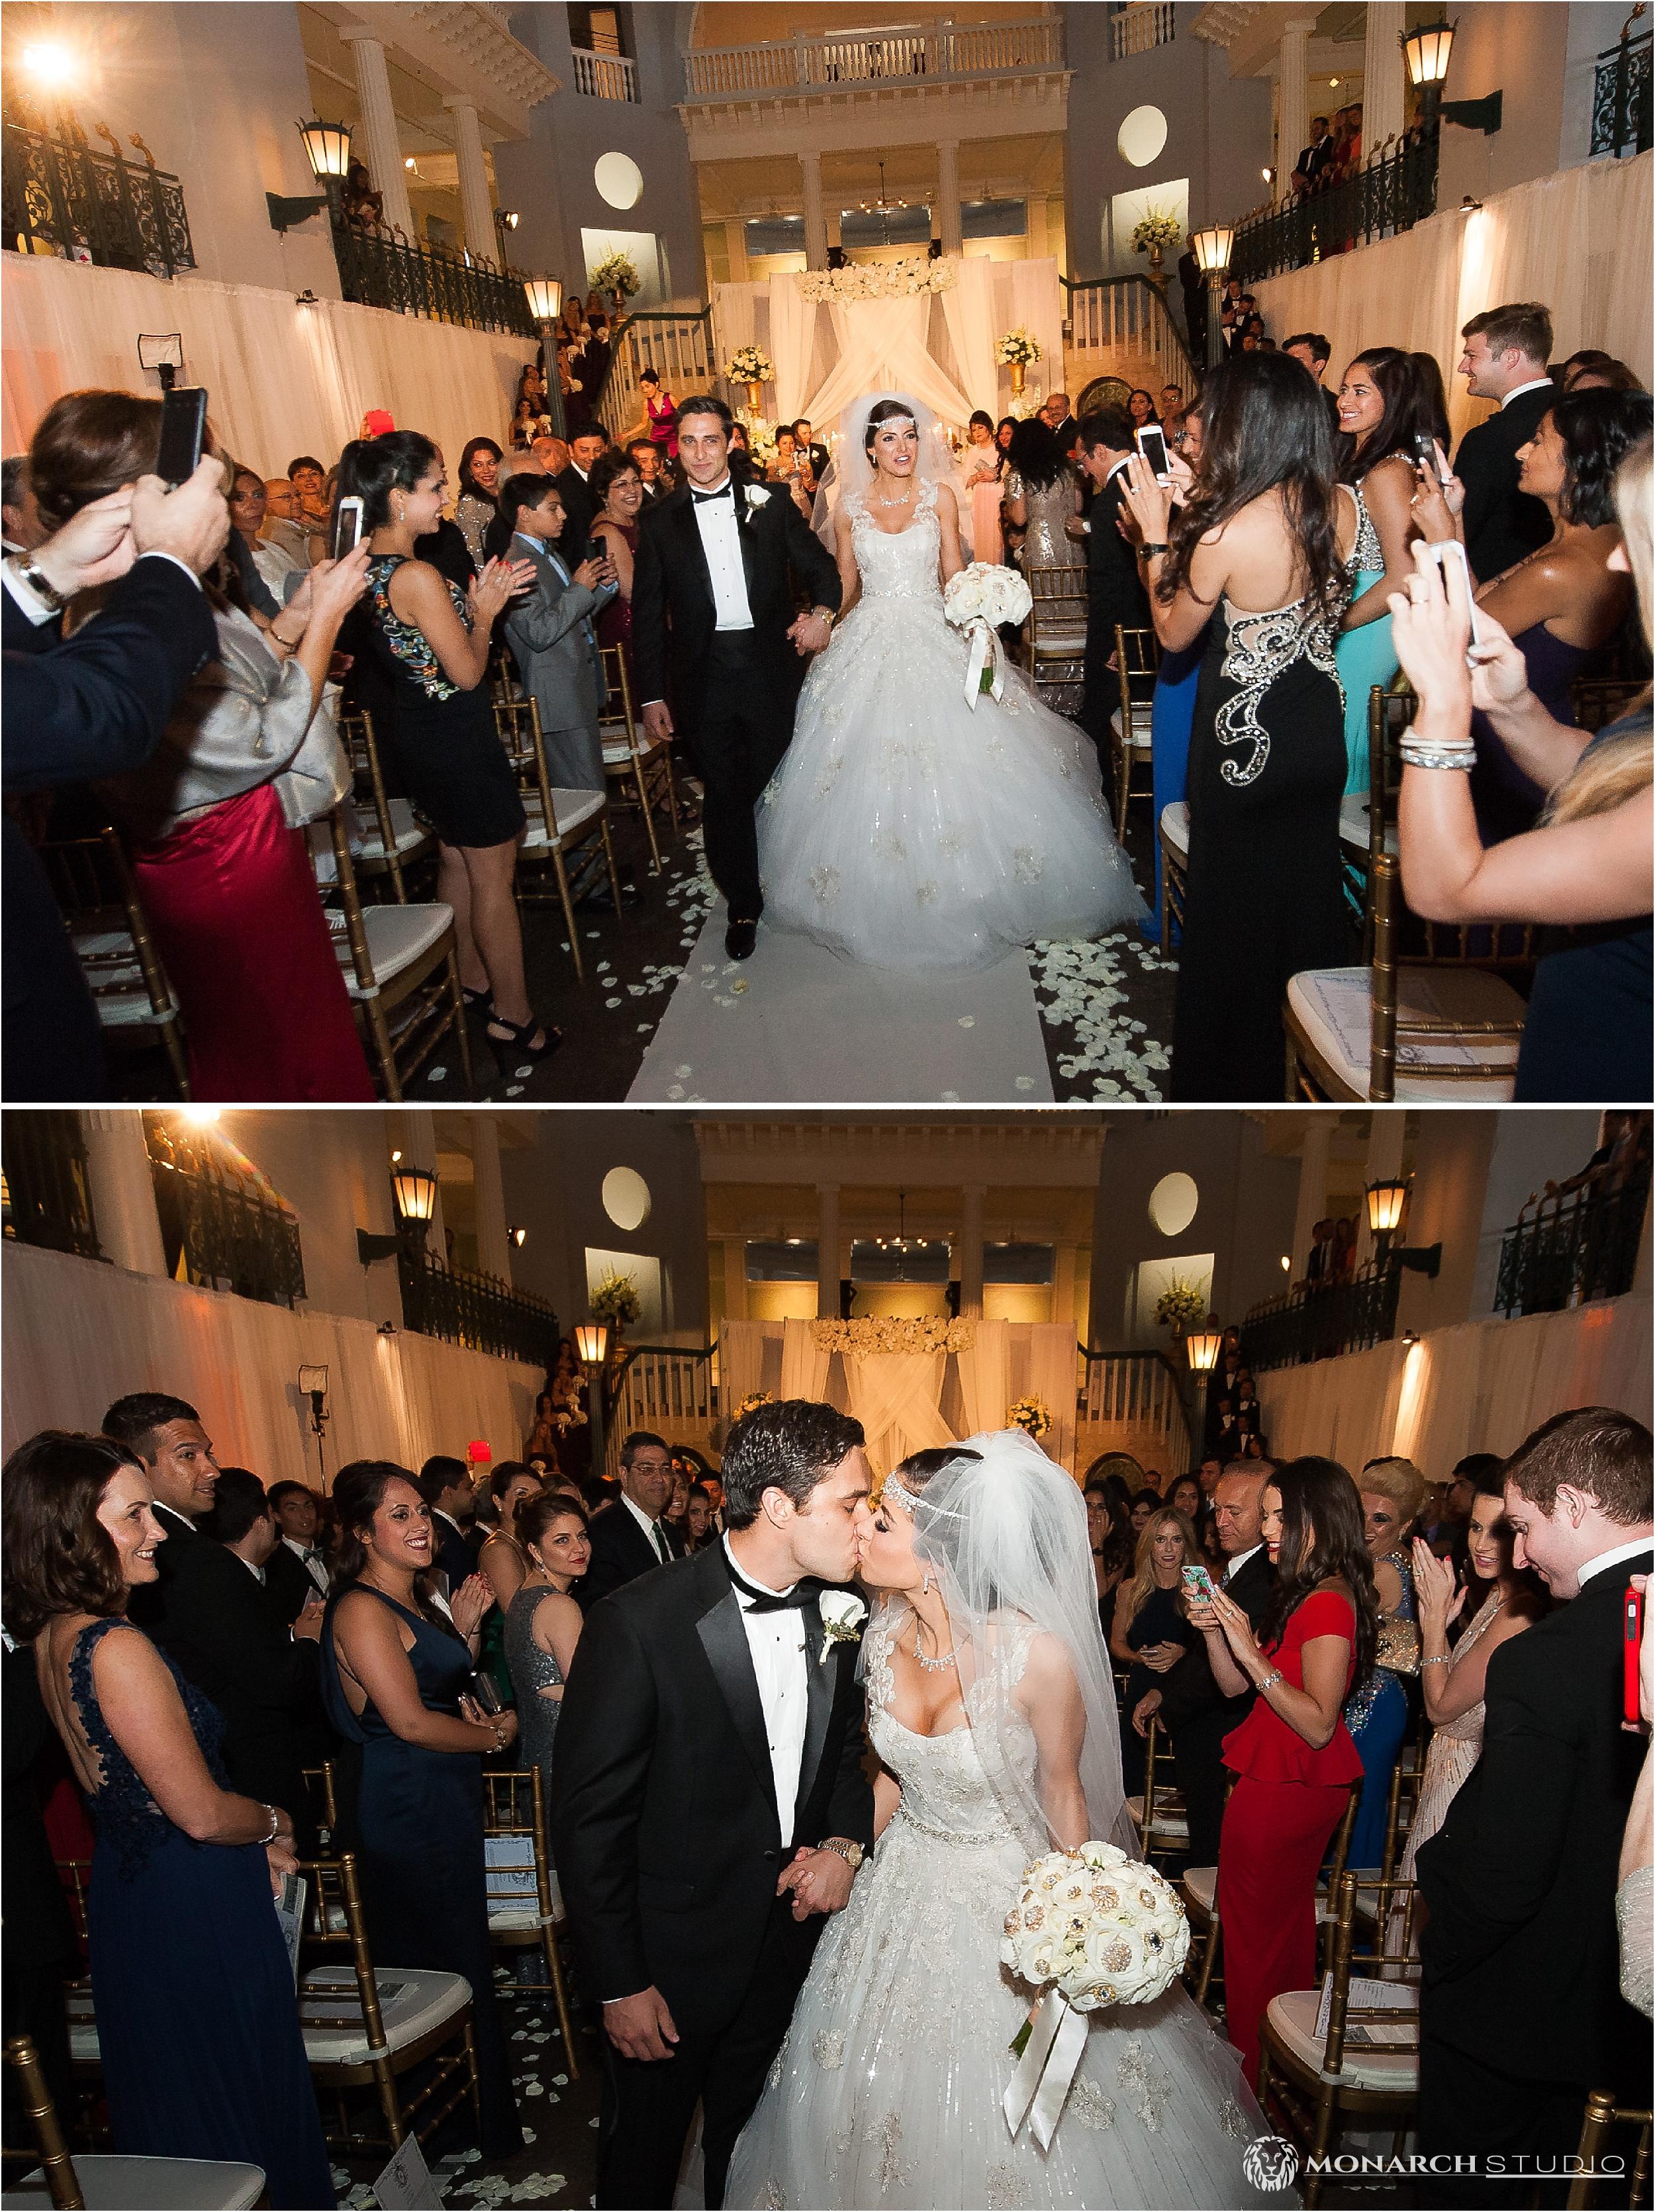 Persian-Aghd-Wedding-Photographer- سفره عقد-037.jpg